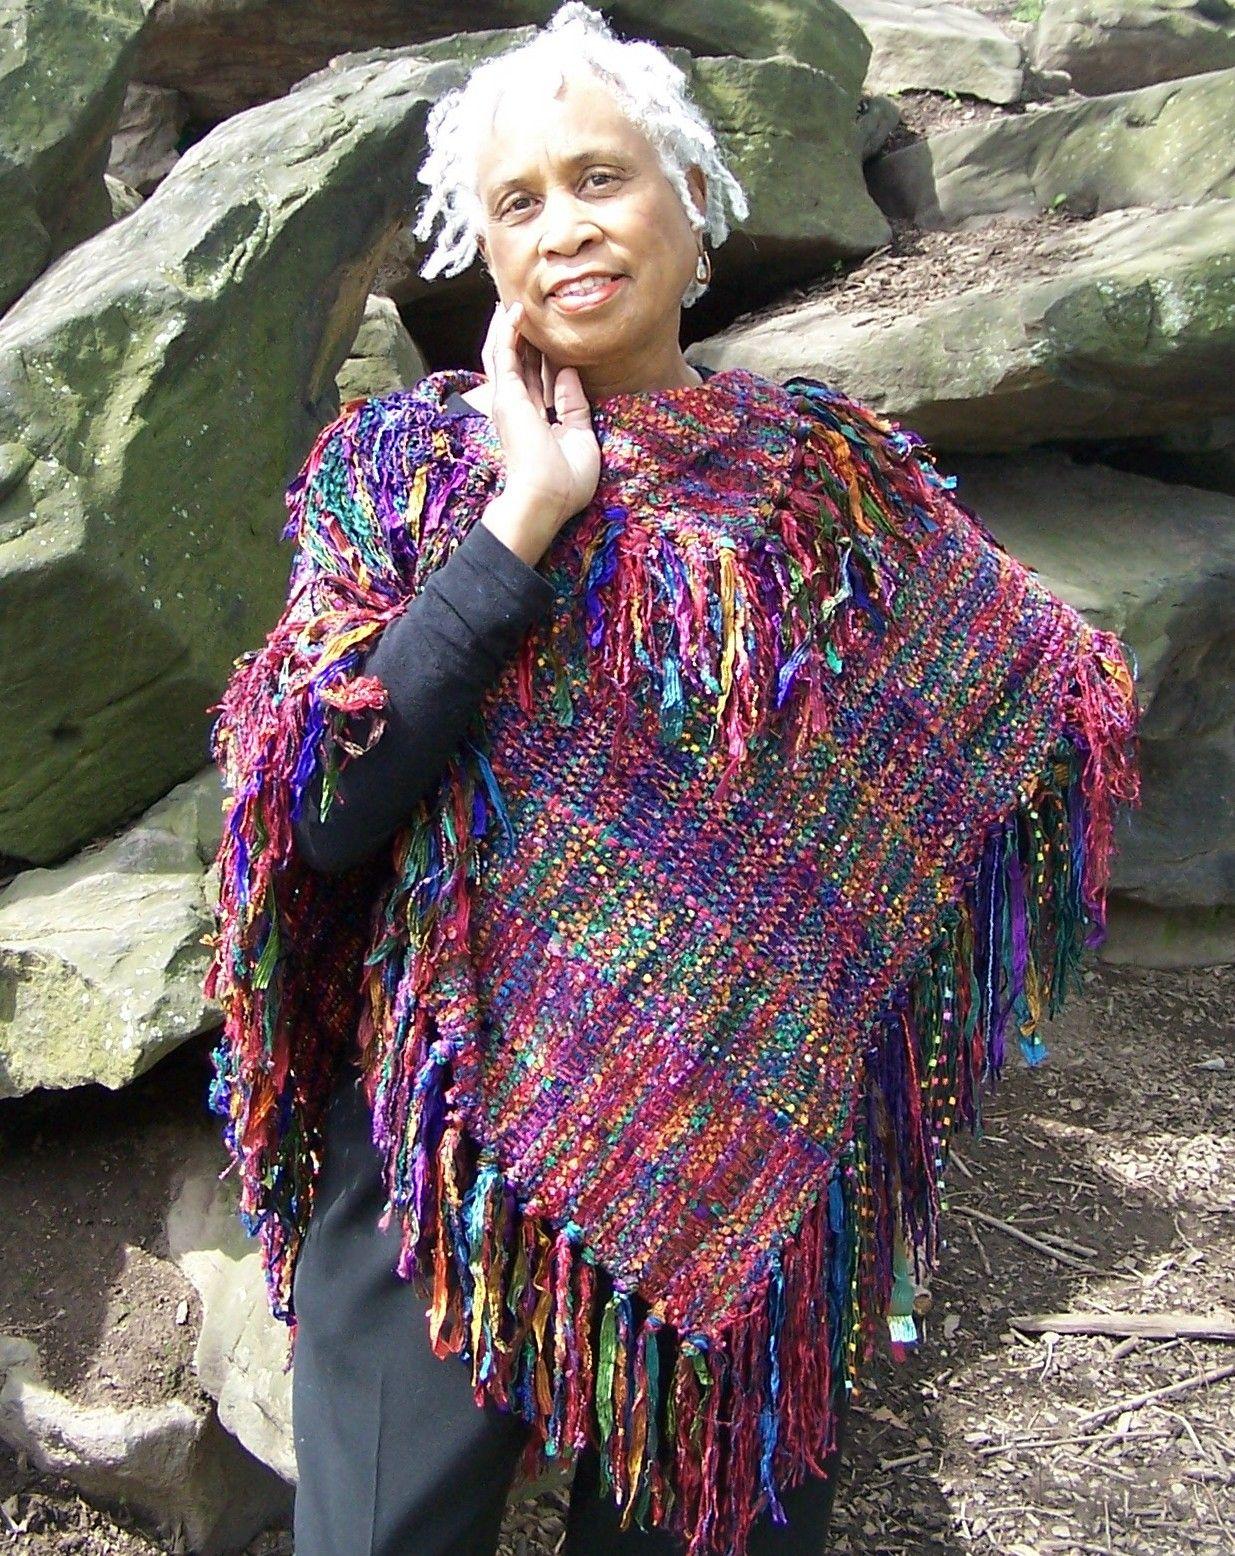 Beautiful colors! Handwoven Poncho ...fits everyone LaVerne Kemp Handwovens www.thewarpedweaver.blogspot.com gypsygal5@aol.com